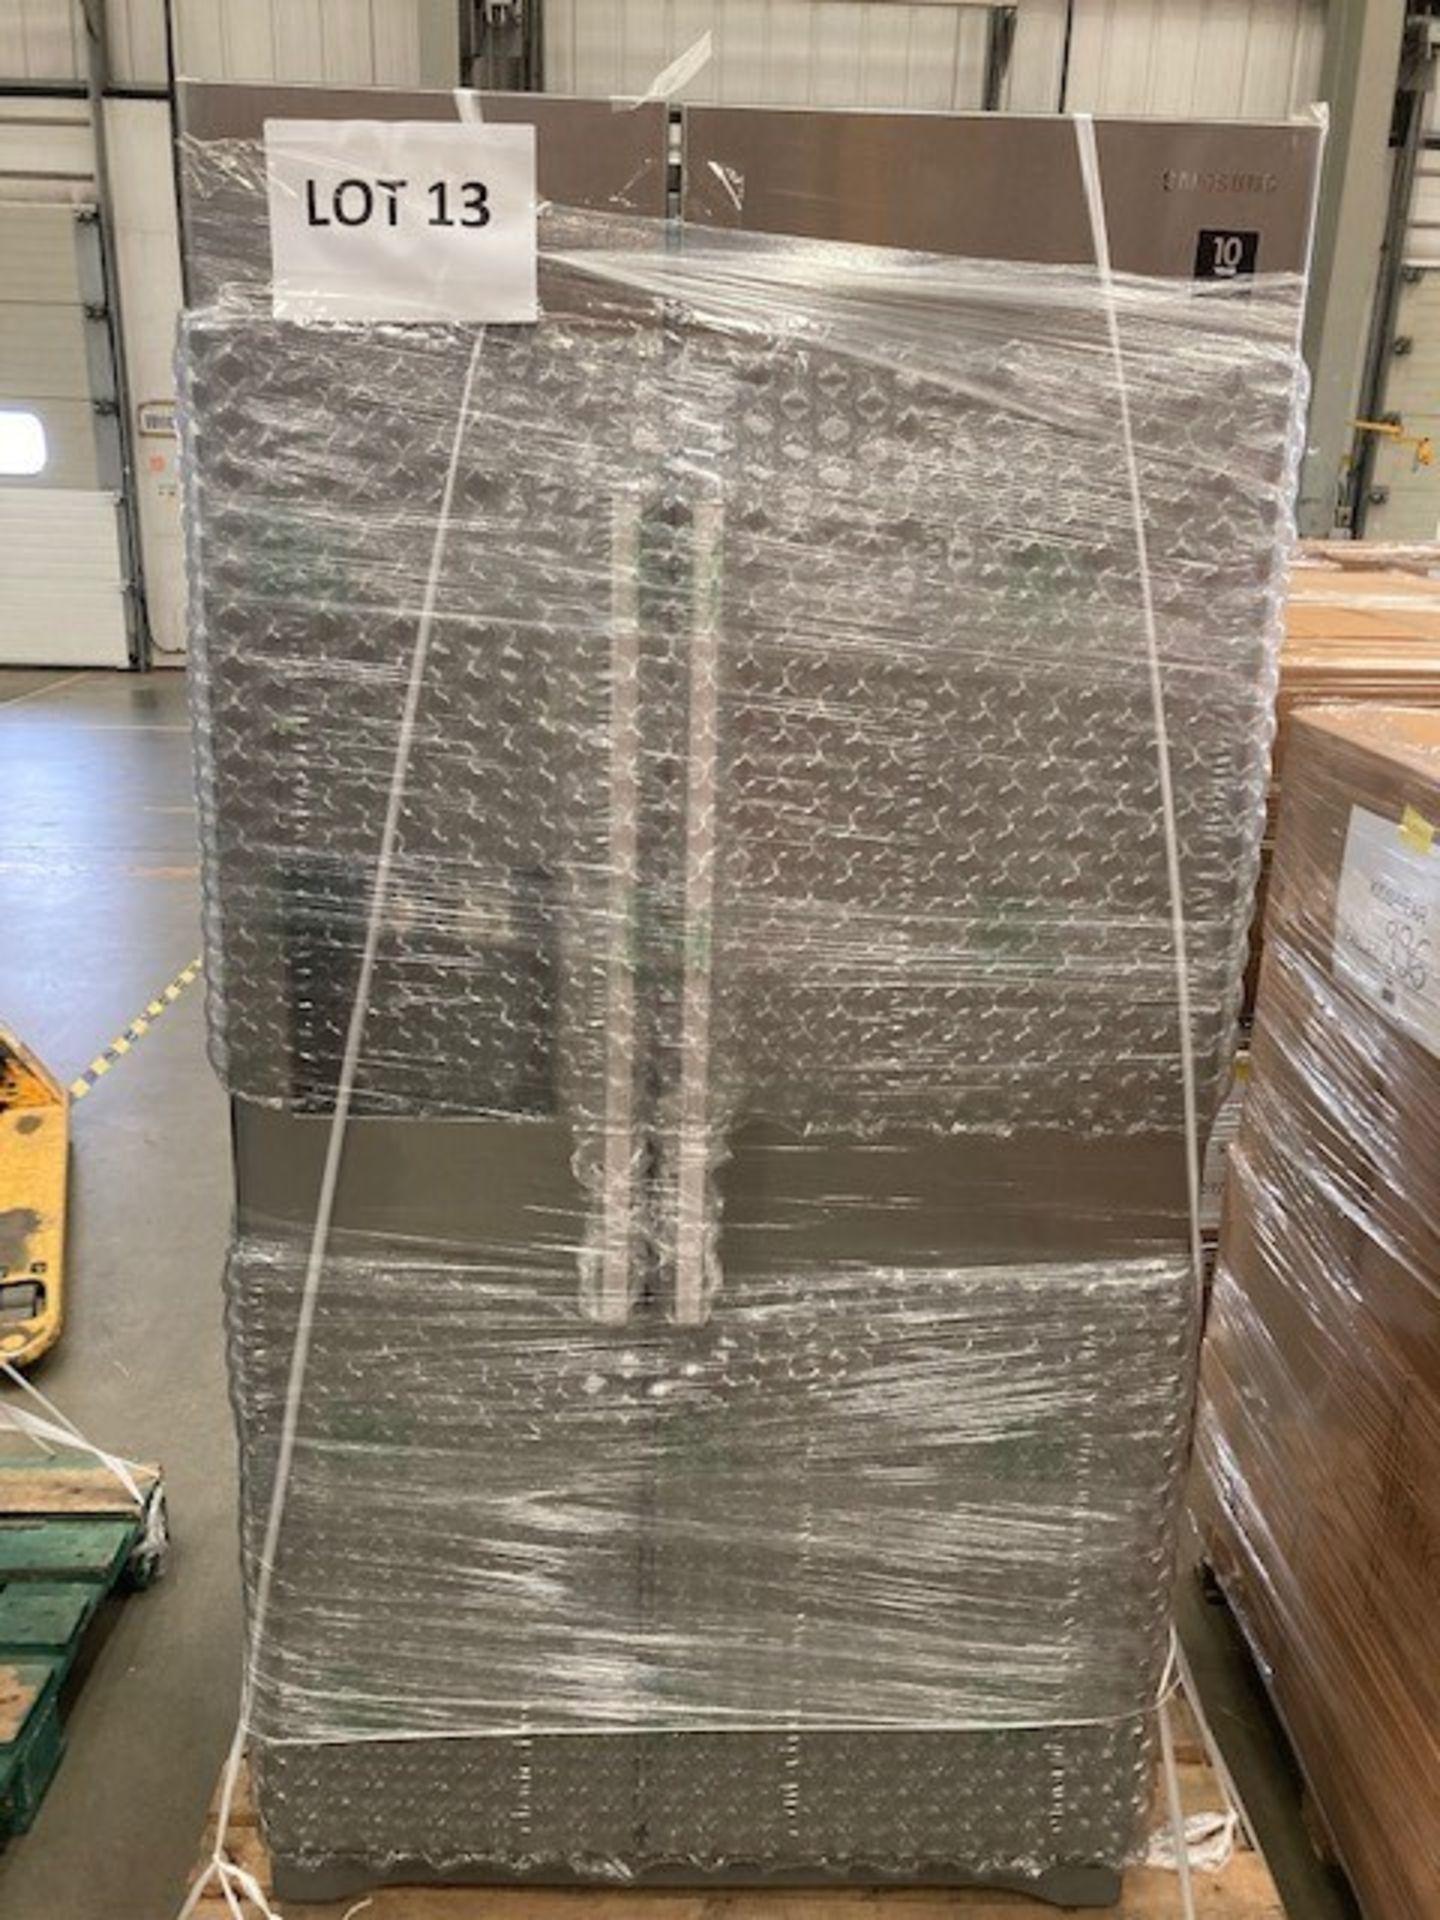 Pallet of 1 Samsung Water & Ice Fridge freezer. Latest selling price £929.99* - Image 4 of 9